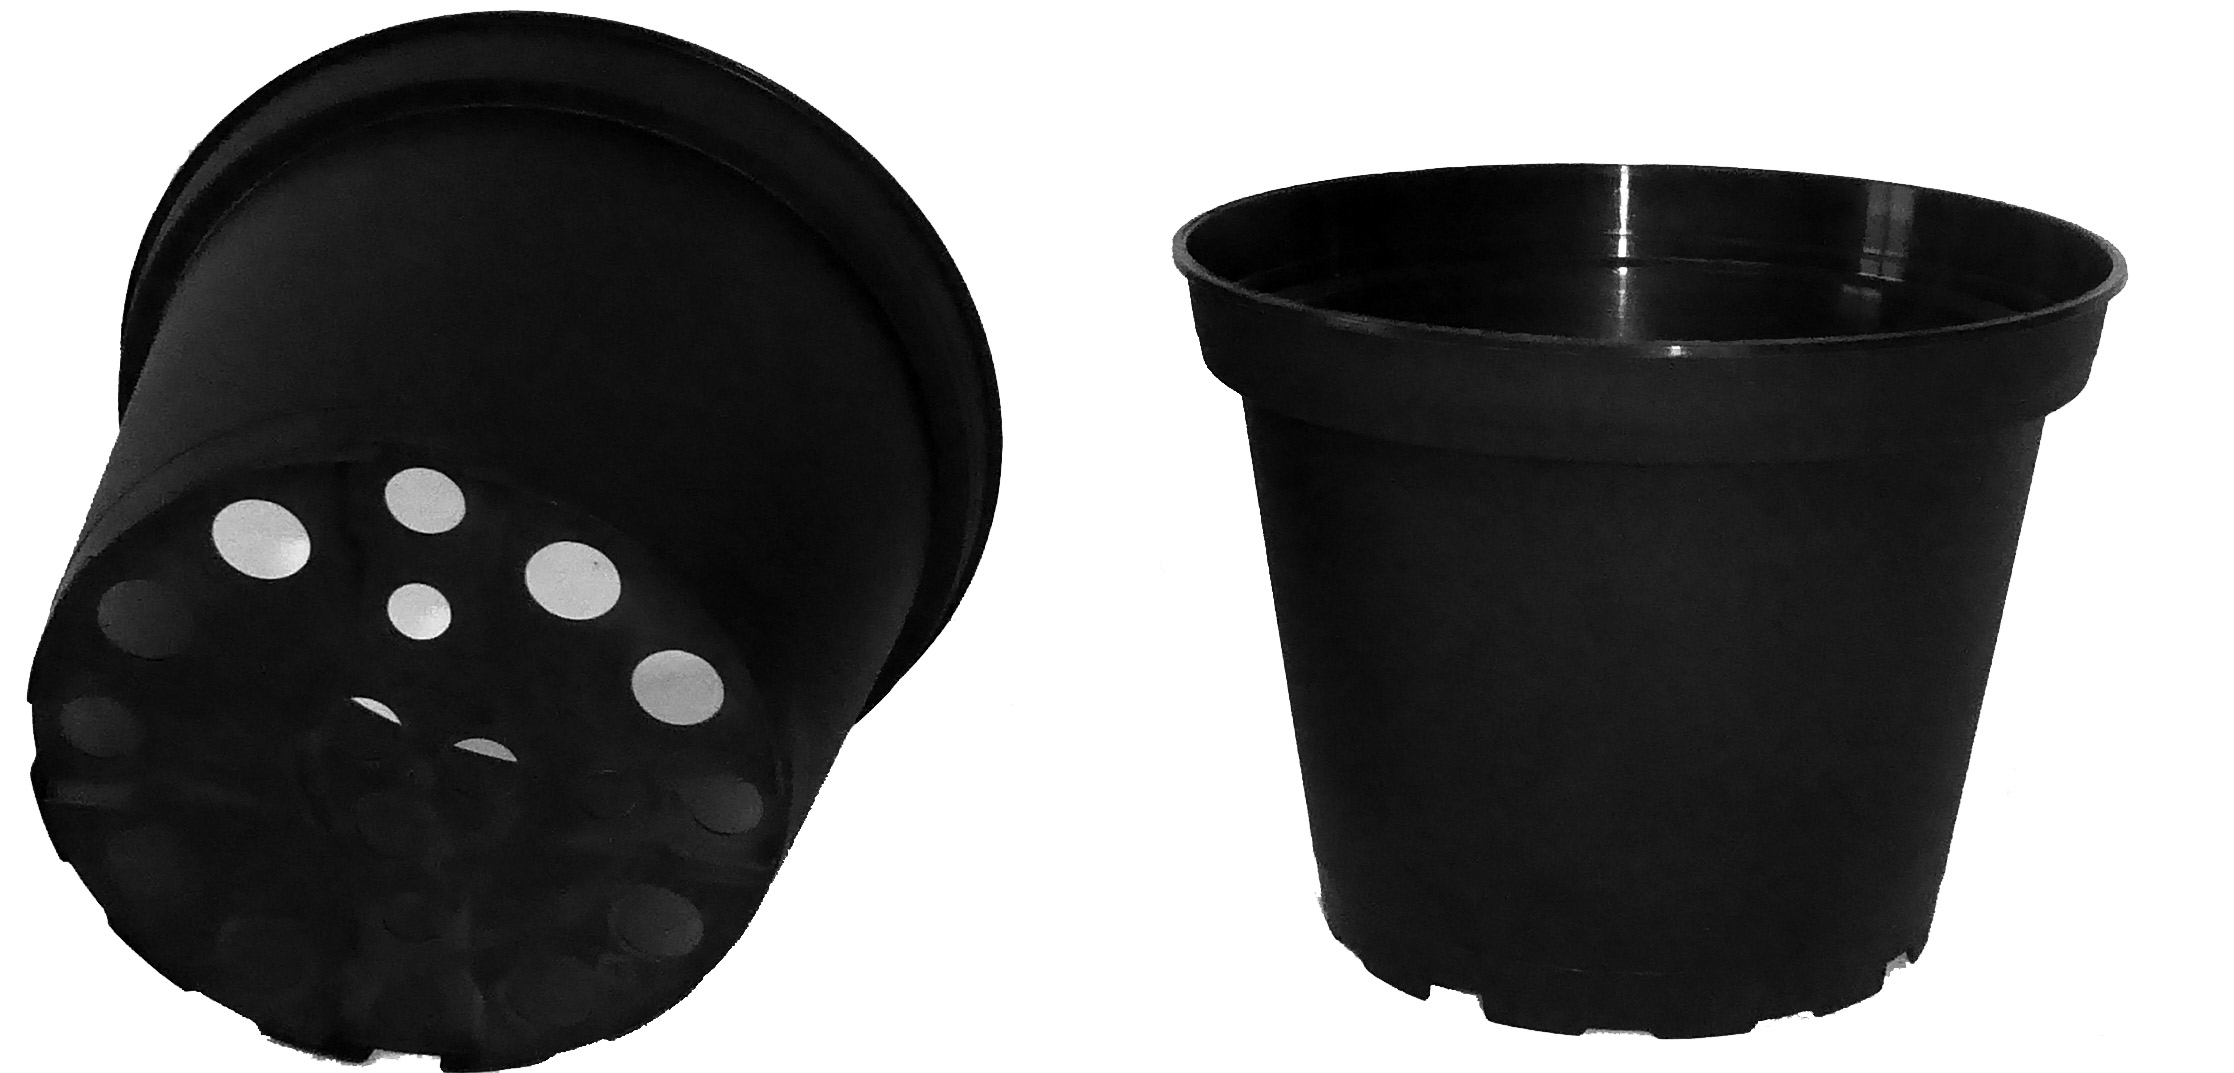 1 litre injection moulded pot